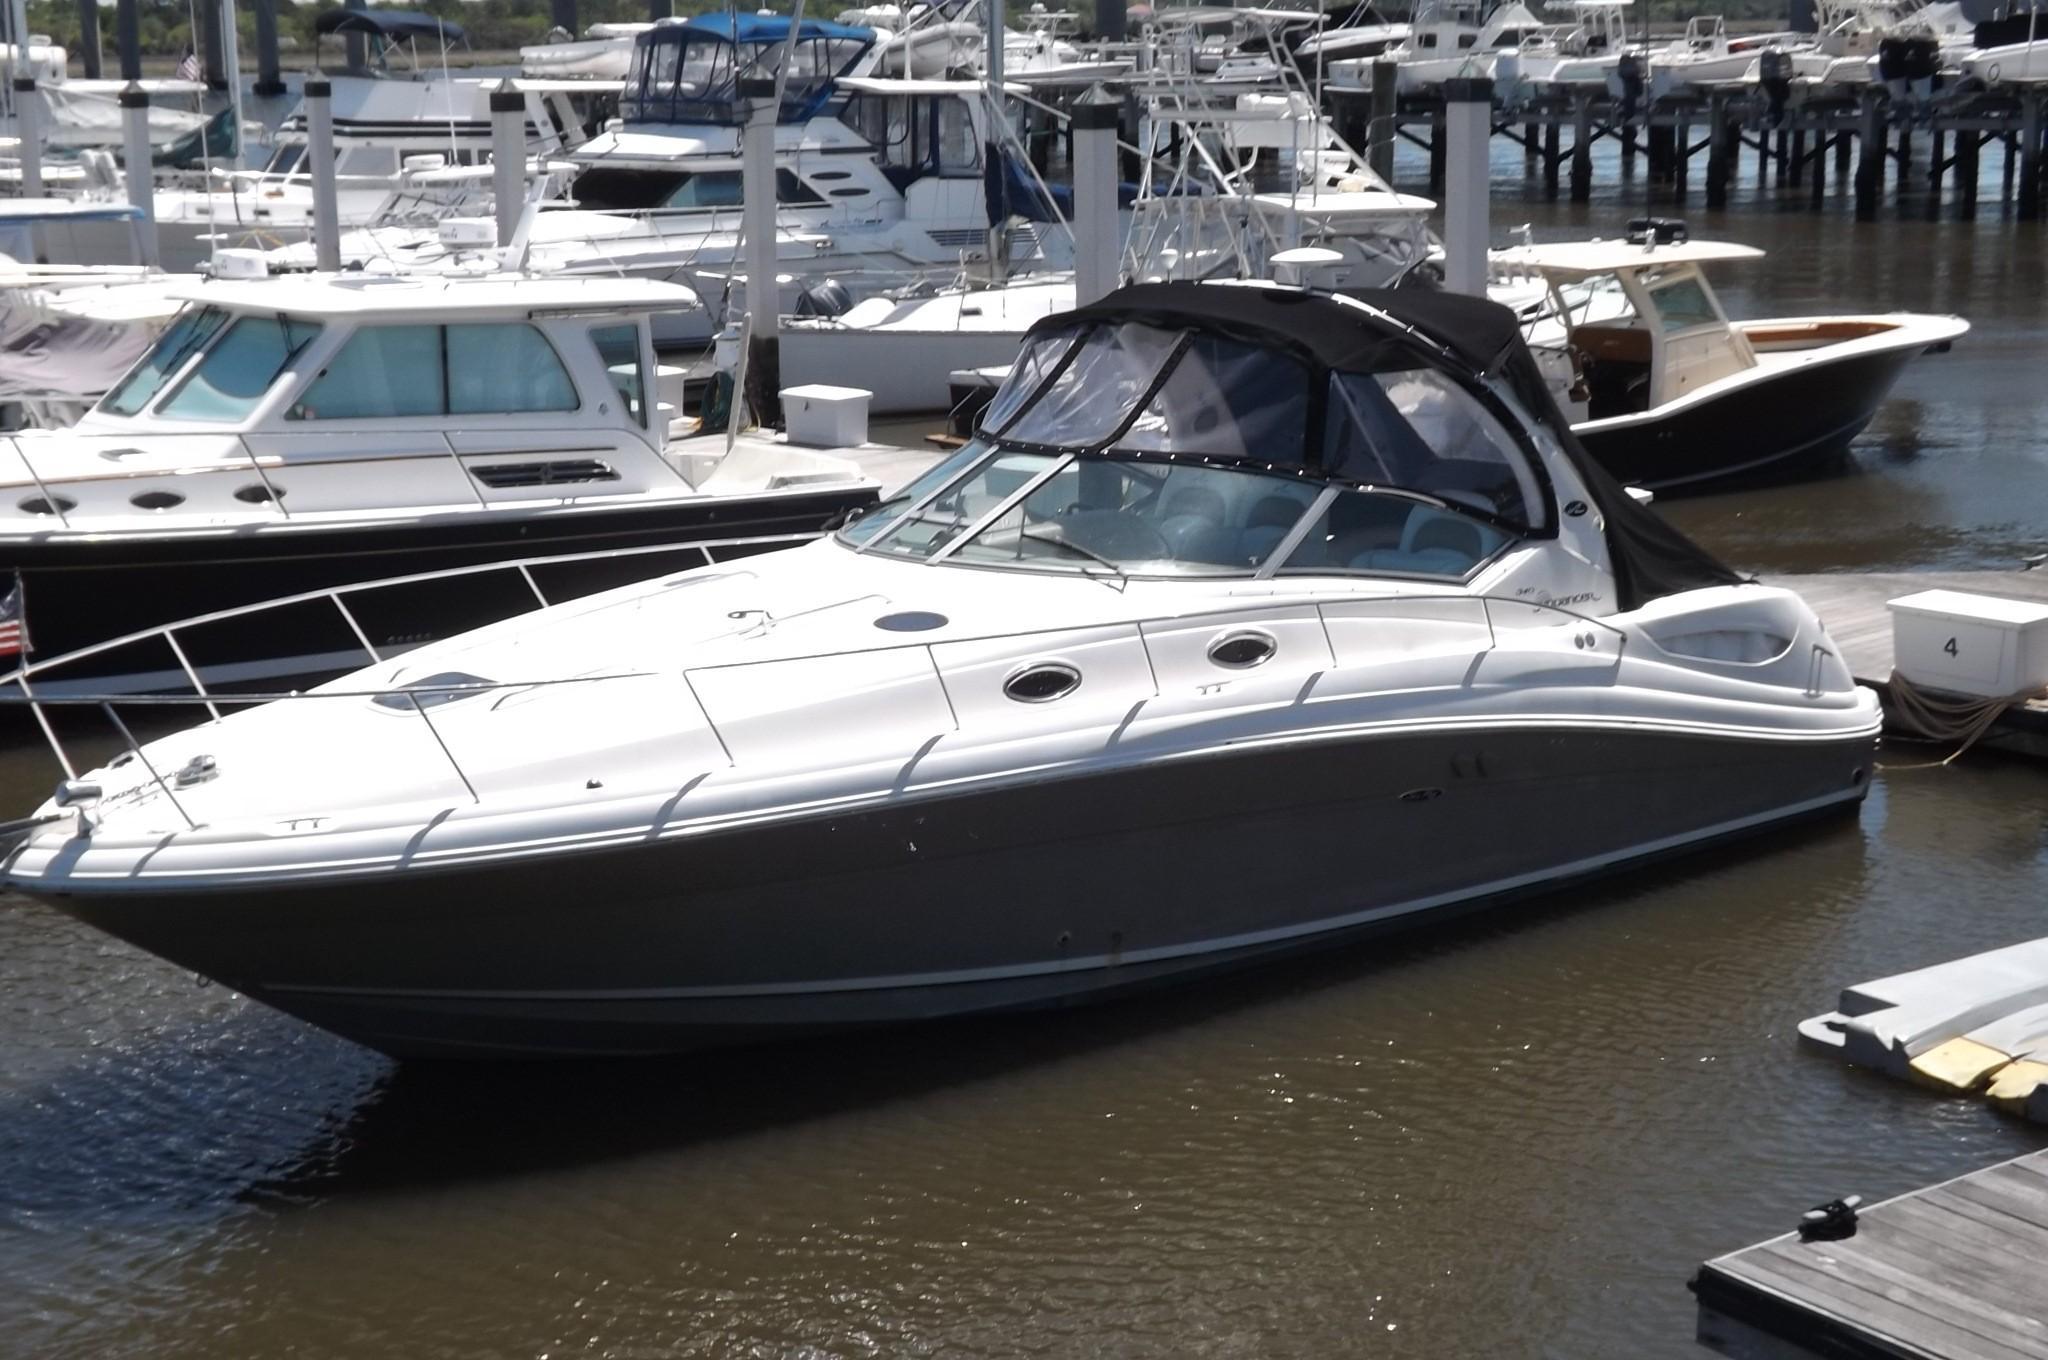 medium resolution of 1997 sea ray 400 sedan bridge power boat for sale www yachtworld com2007 sea ray 340